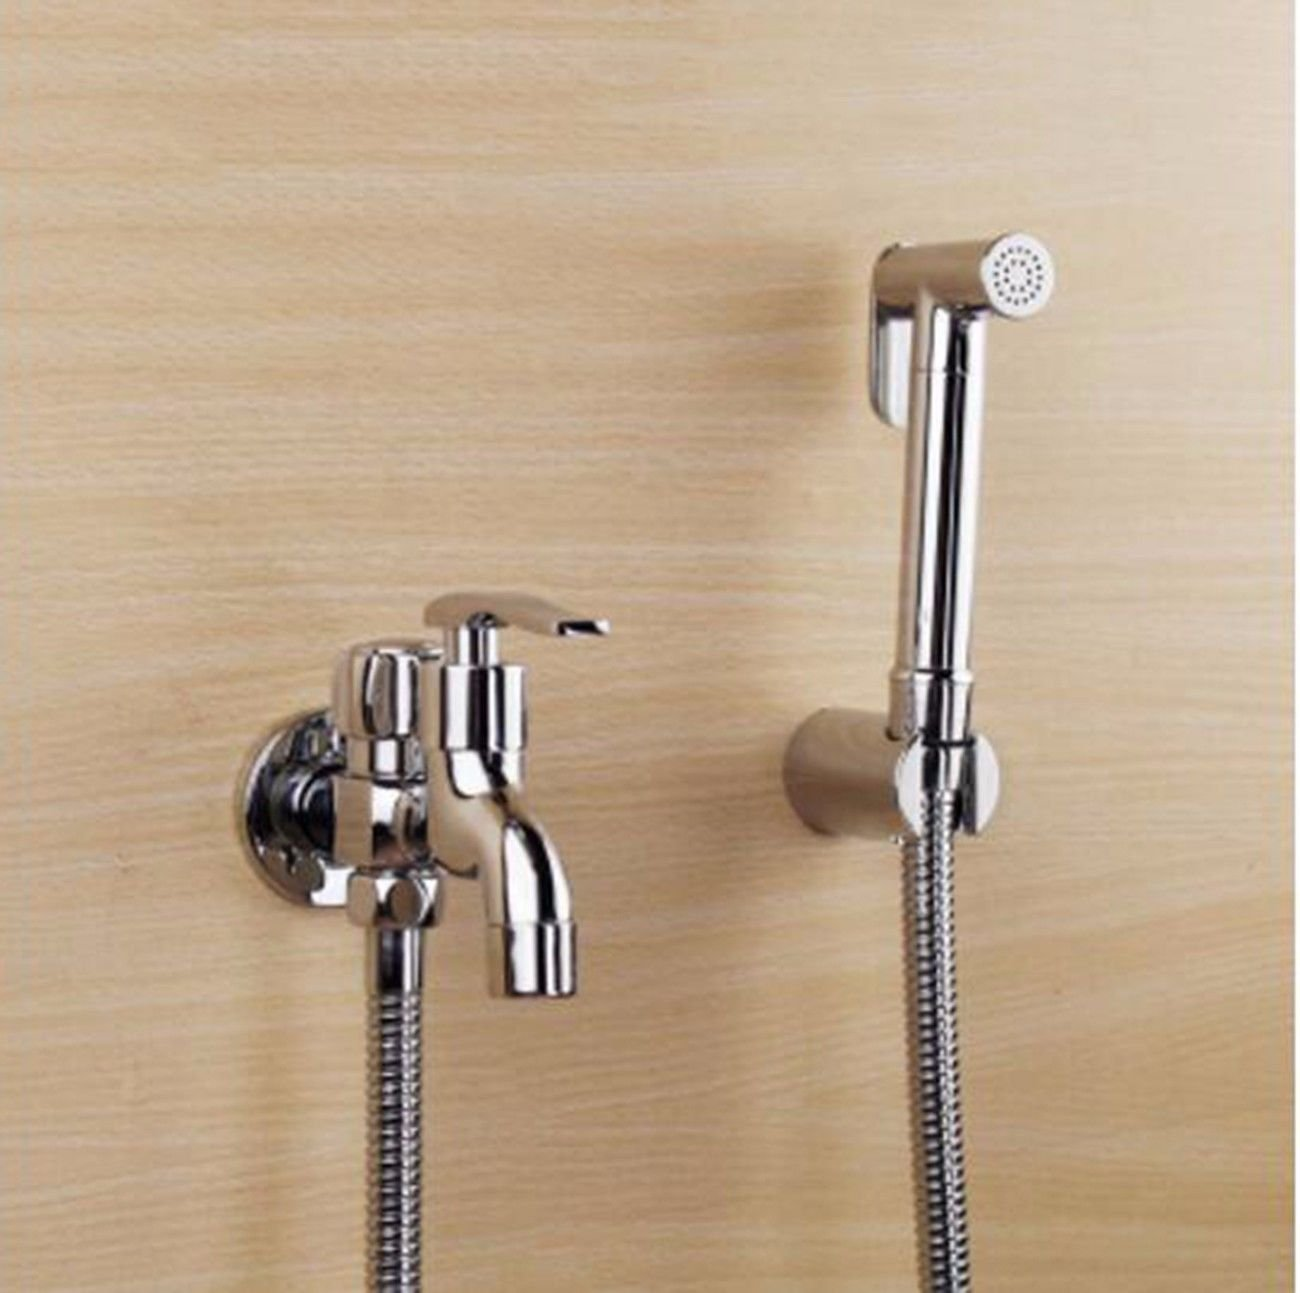 E Hlluya Professional Sink Mixer Tap Kitchen Faucet Boost your handheld showers maternal wash, shower faucets Shower Toilet valve faucet Suite B